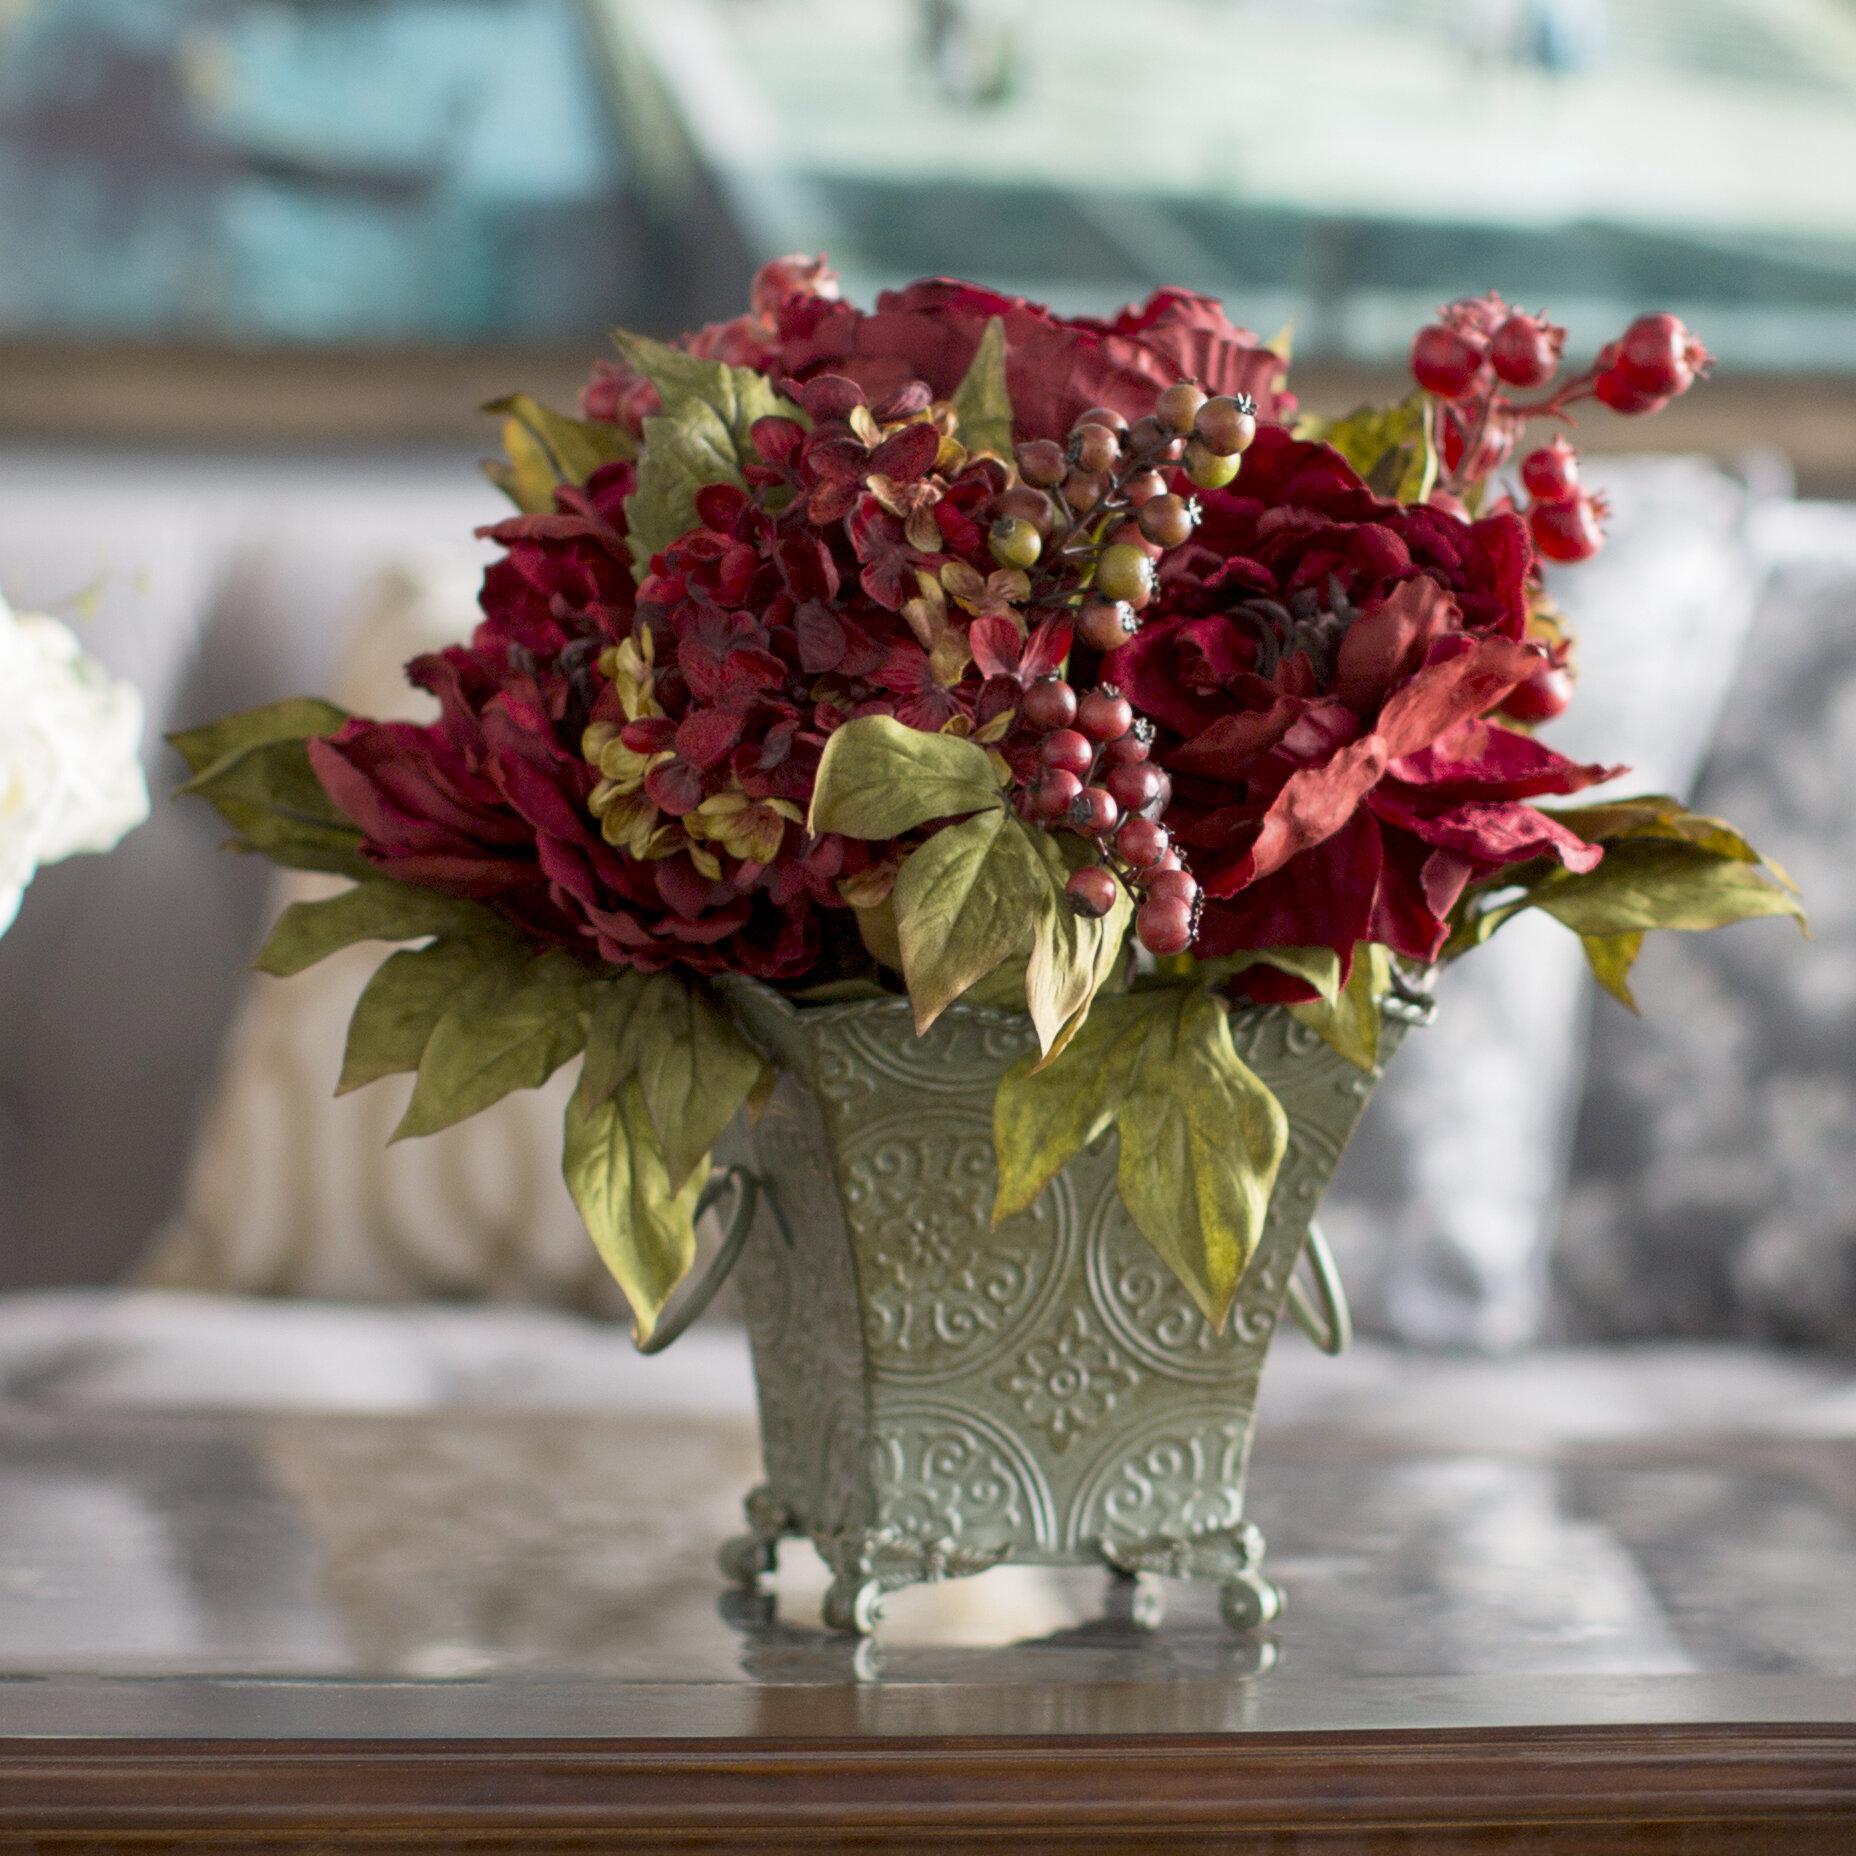 Astoria grand peony and hydrangea silk flower arrangement in rustic astoria grand peony and hydrangea silk flower arrangement in rustic green bucket reviews wayfair mightylinksfo